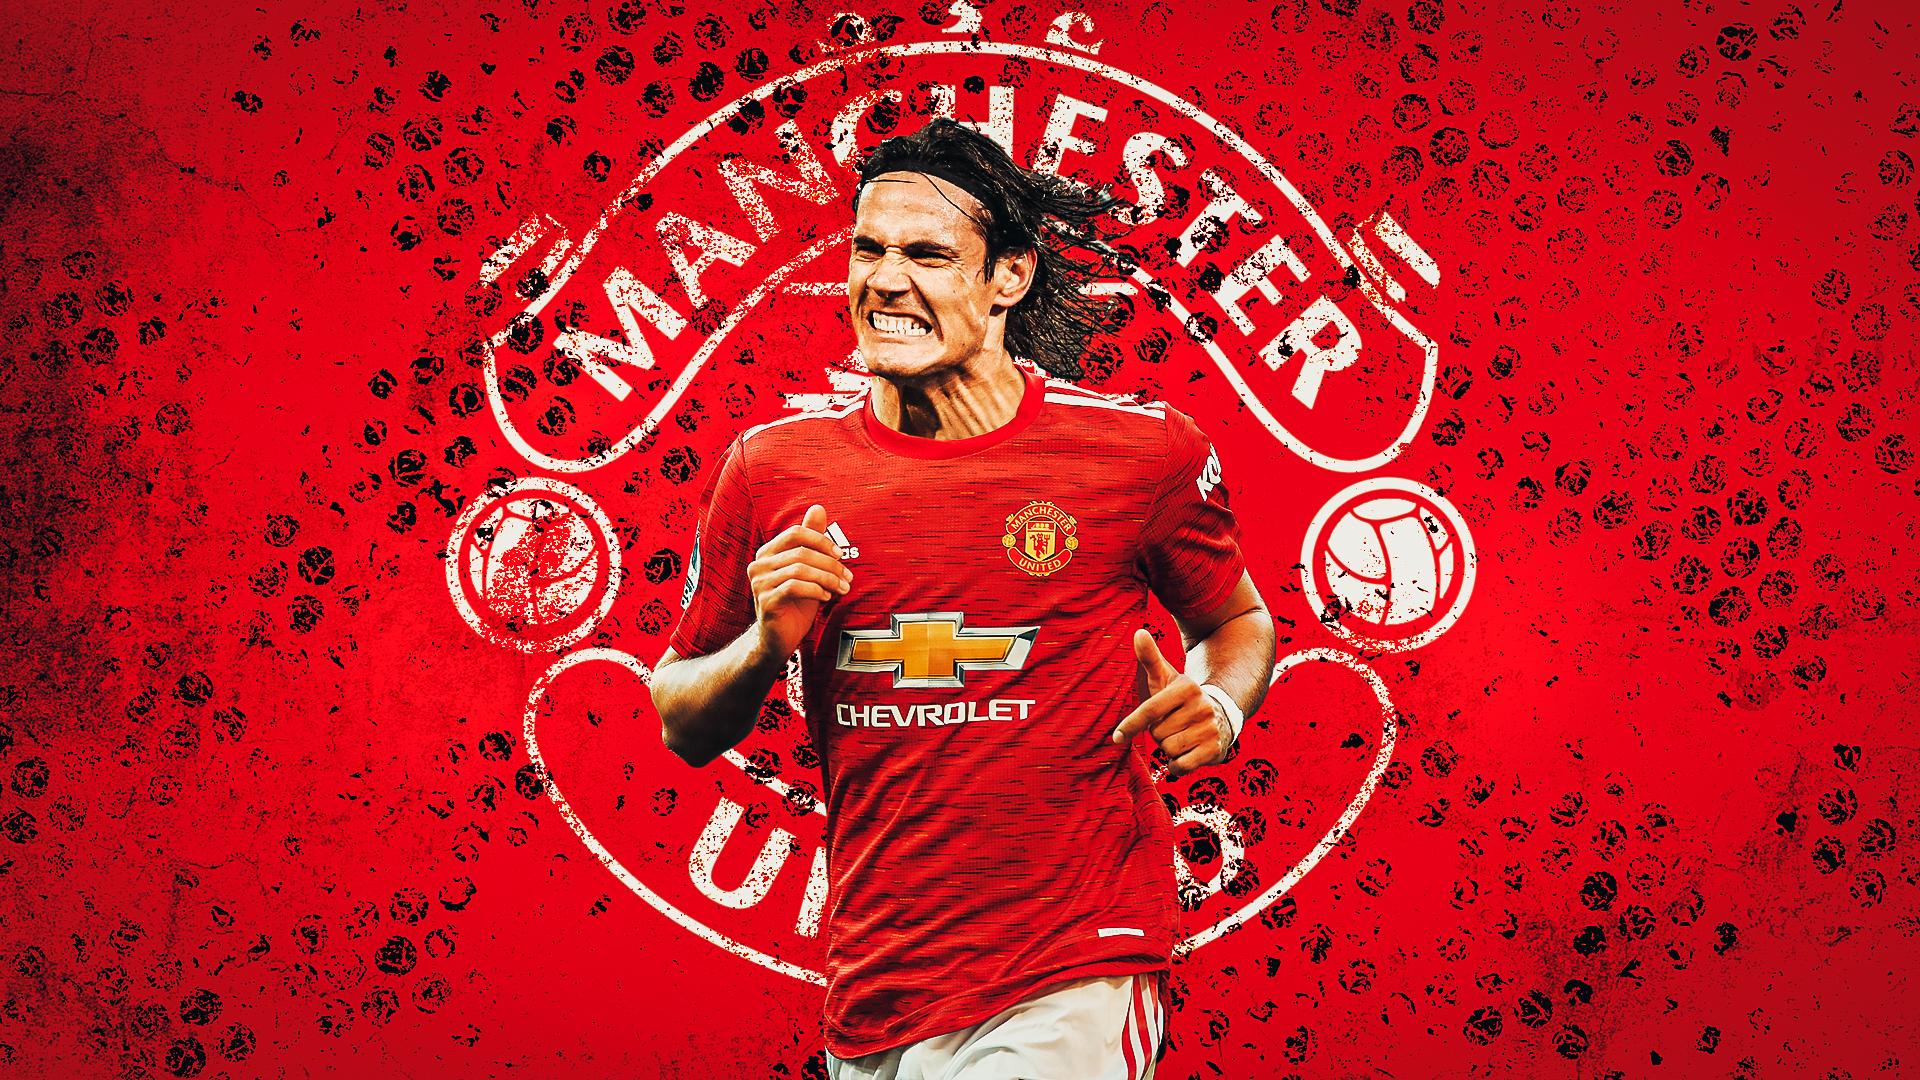 Edinson Cavani Diego Forlan Yang Bikin Saya Ke Manchester United Goal Com